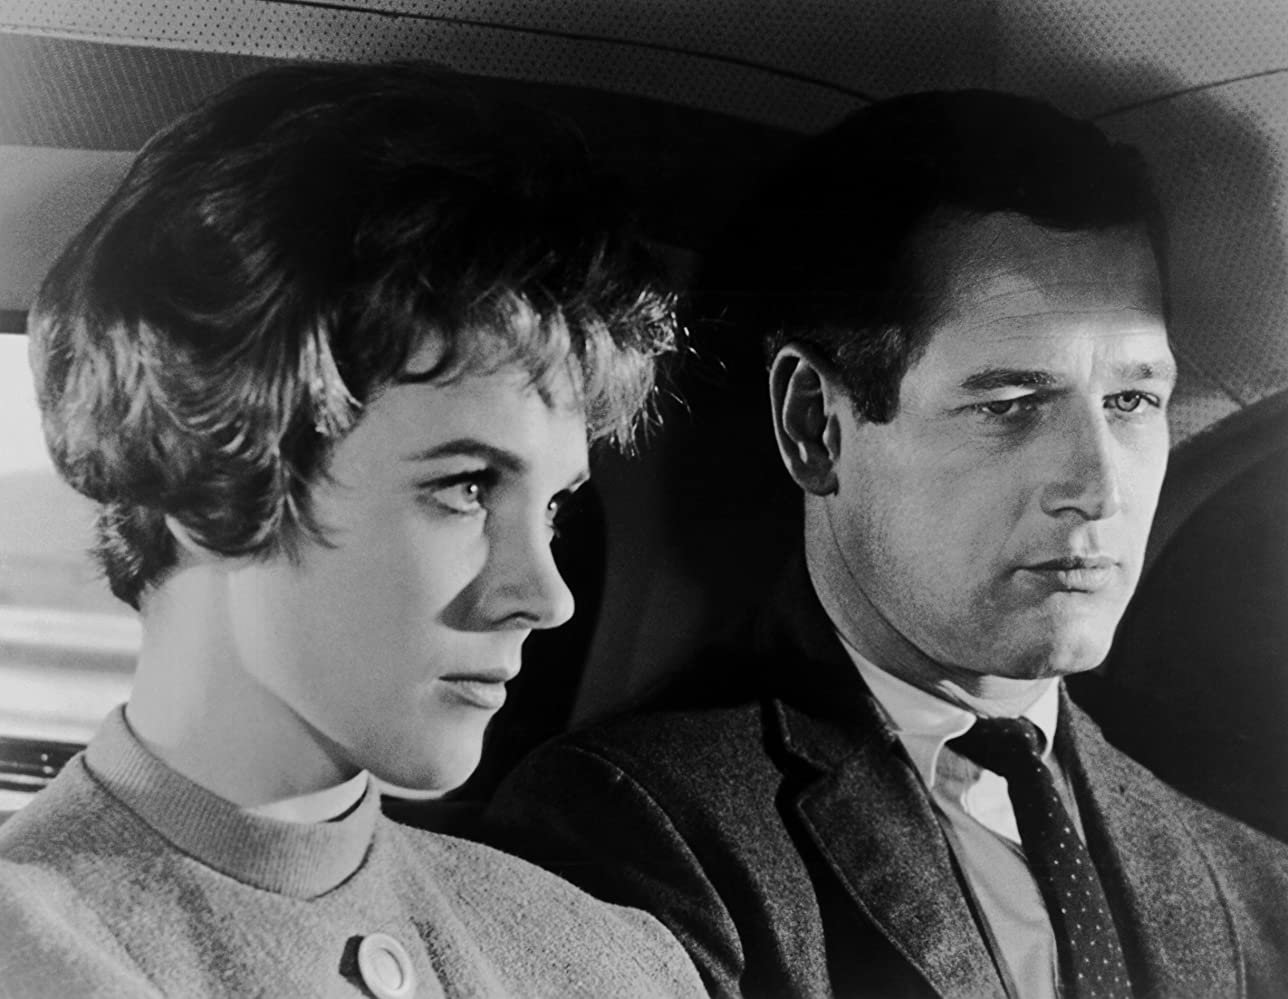 Torn curtain julie andrews - Torn Curtain Julie Andrews 37